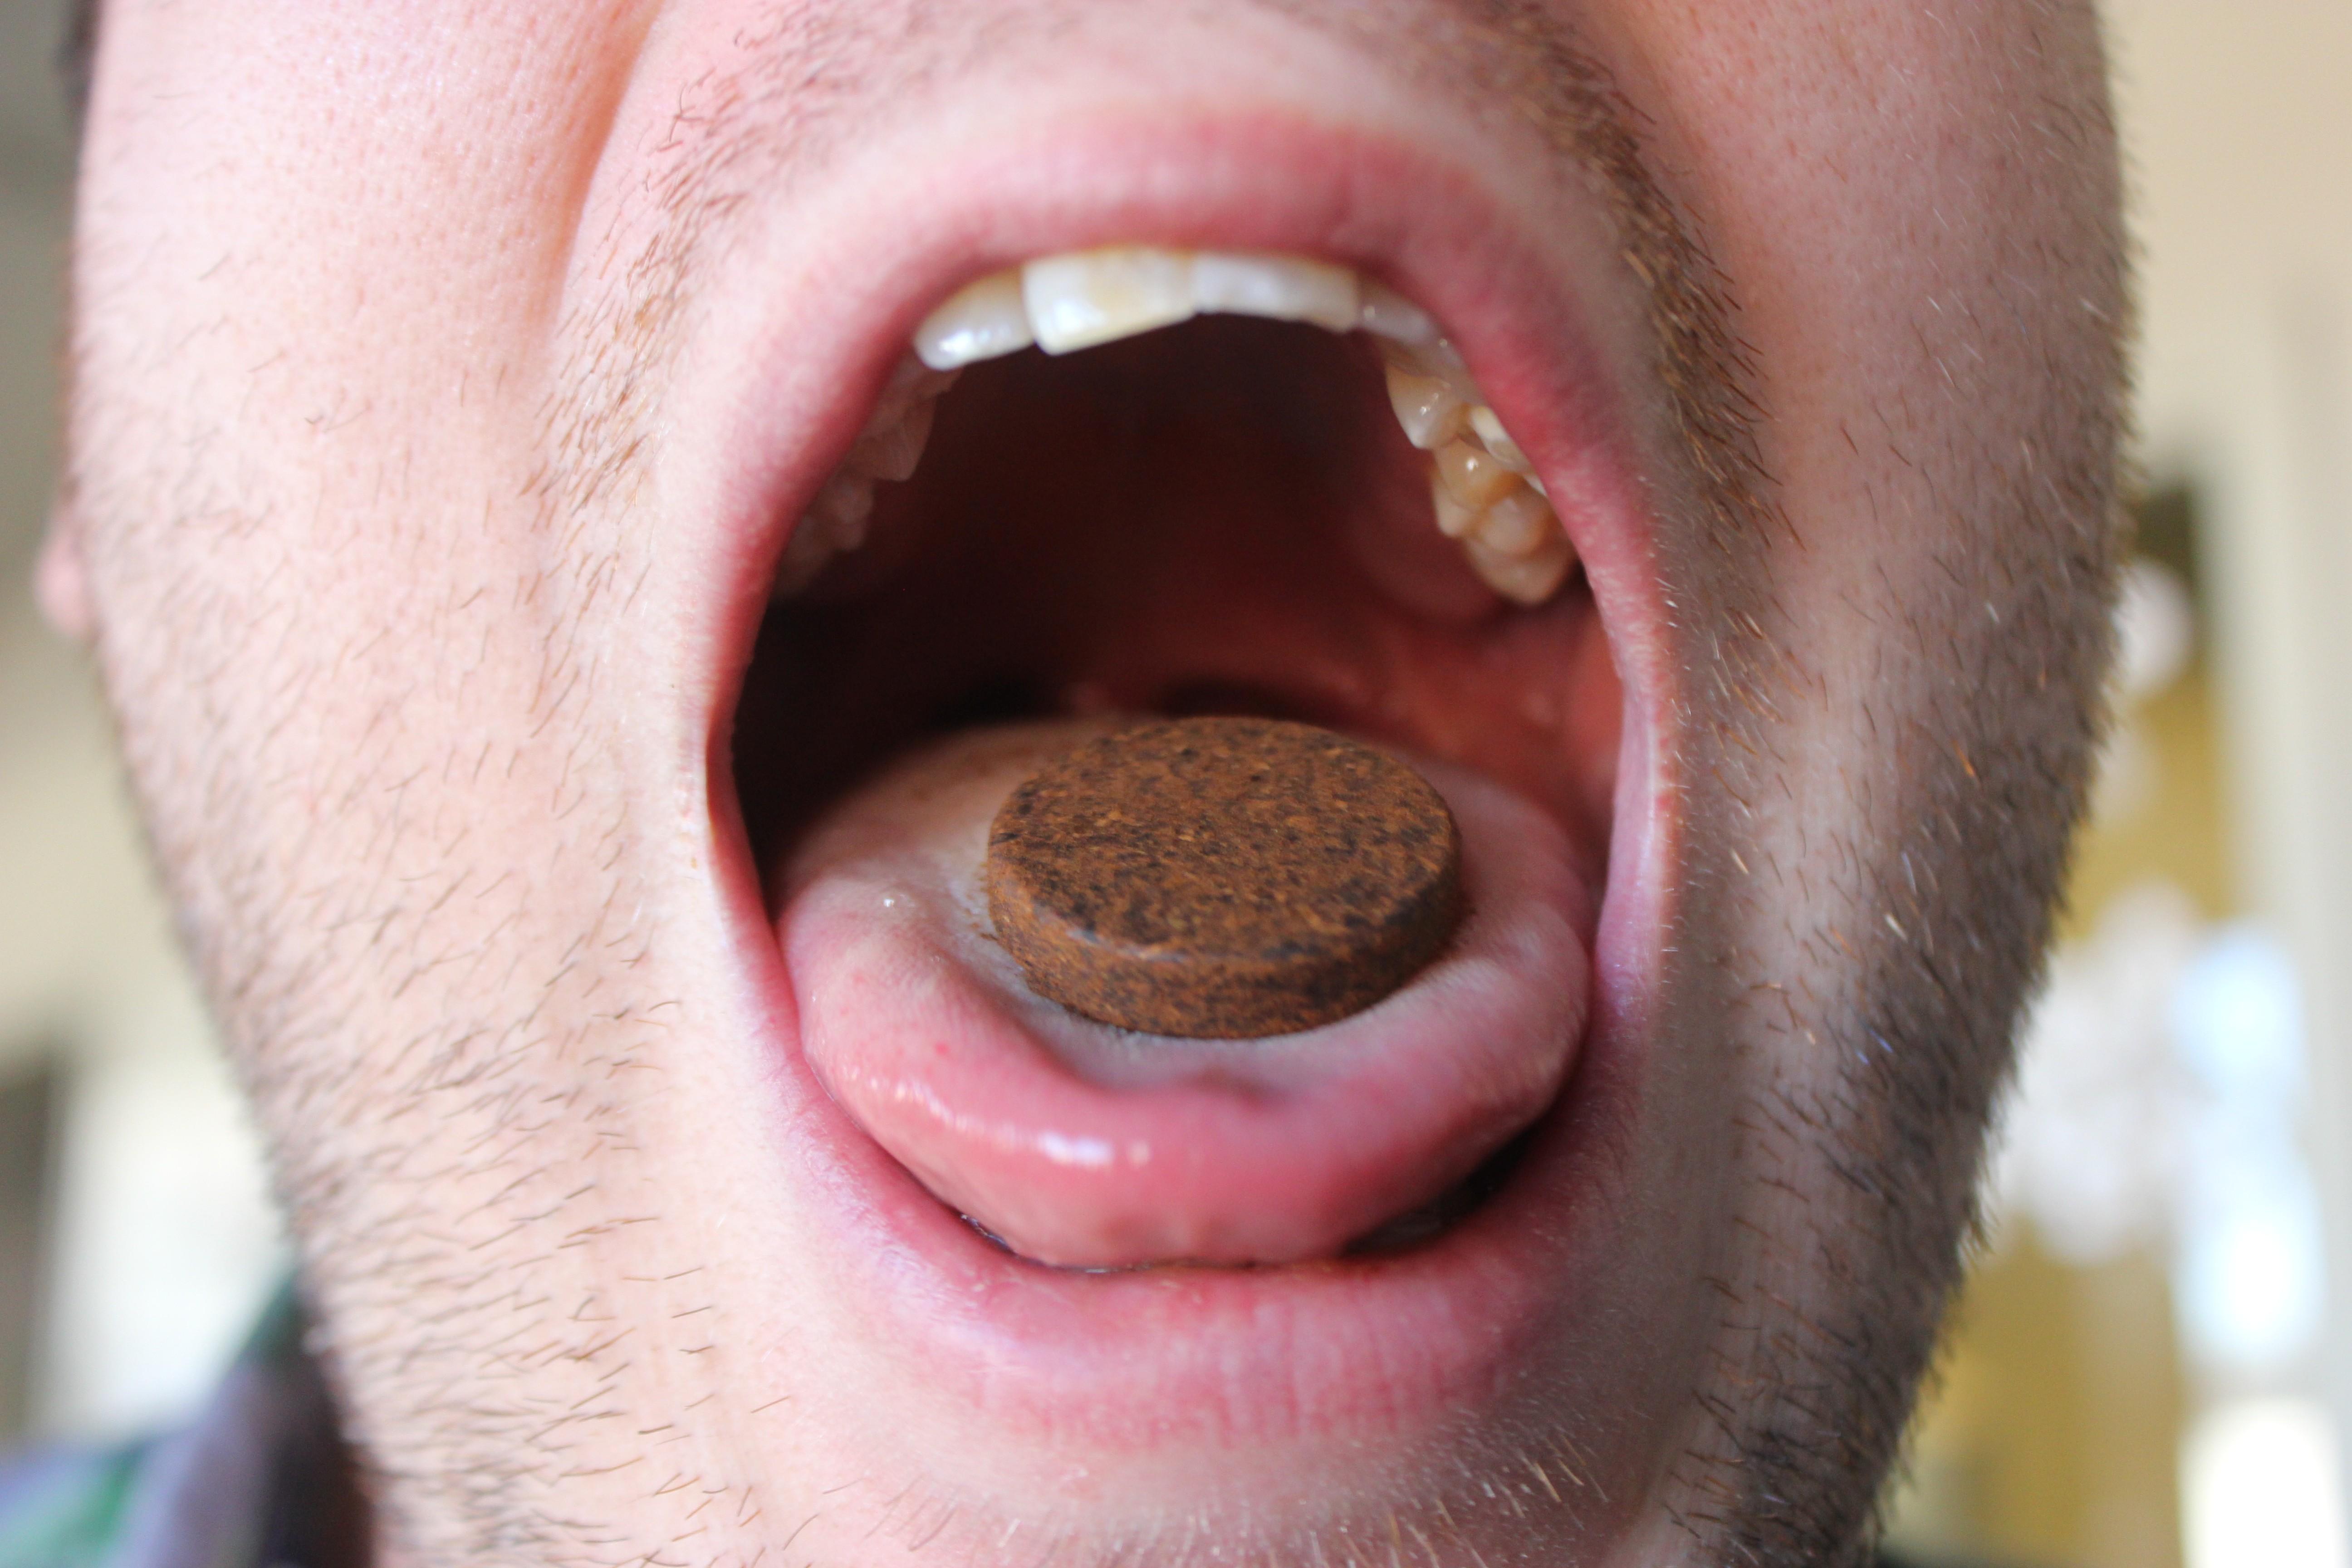 eat coffee grounds